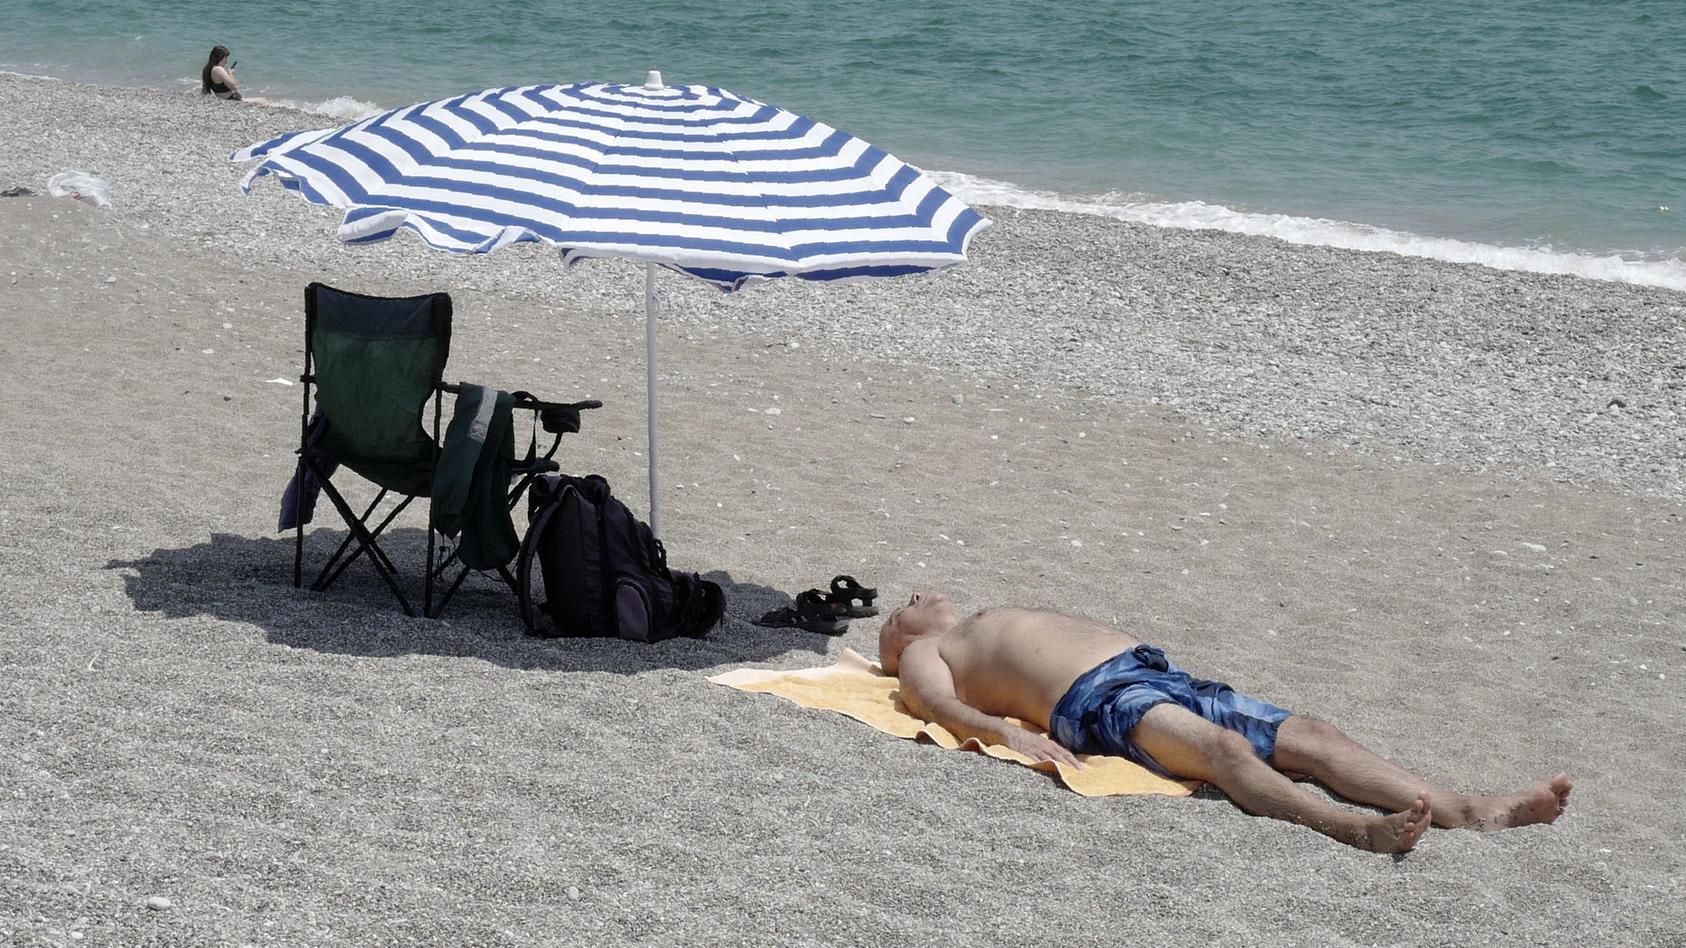 Türkei Reisewarnung Aufgehoben